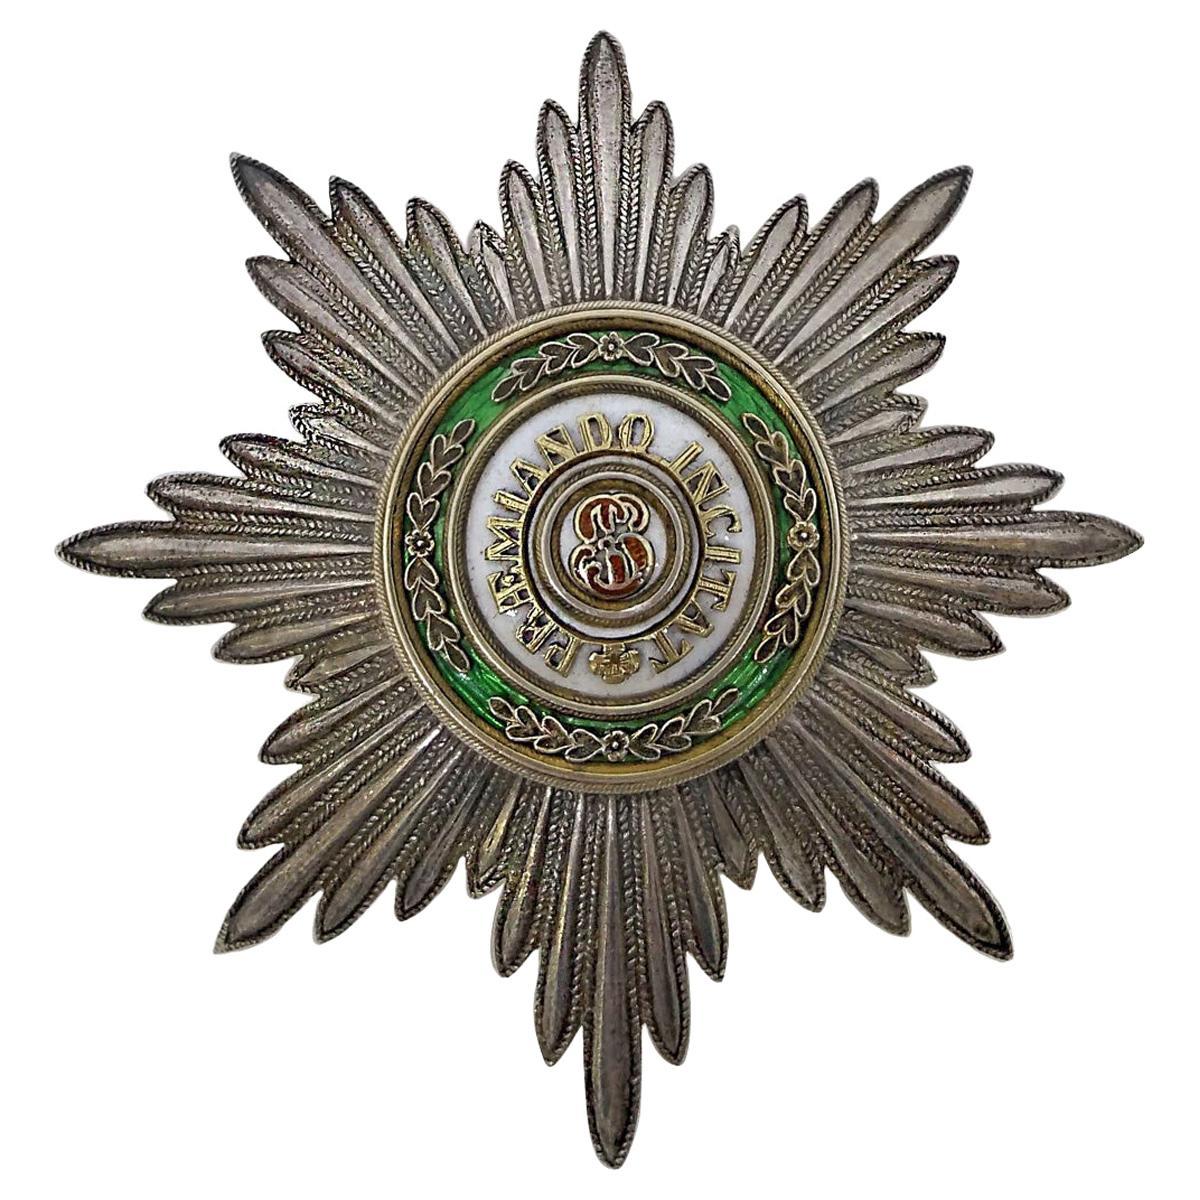 20th Century Russian Silver & Enamel St.Stanislaus Breast Star, circa 1900